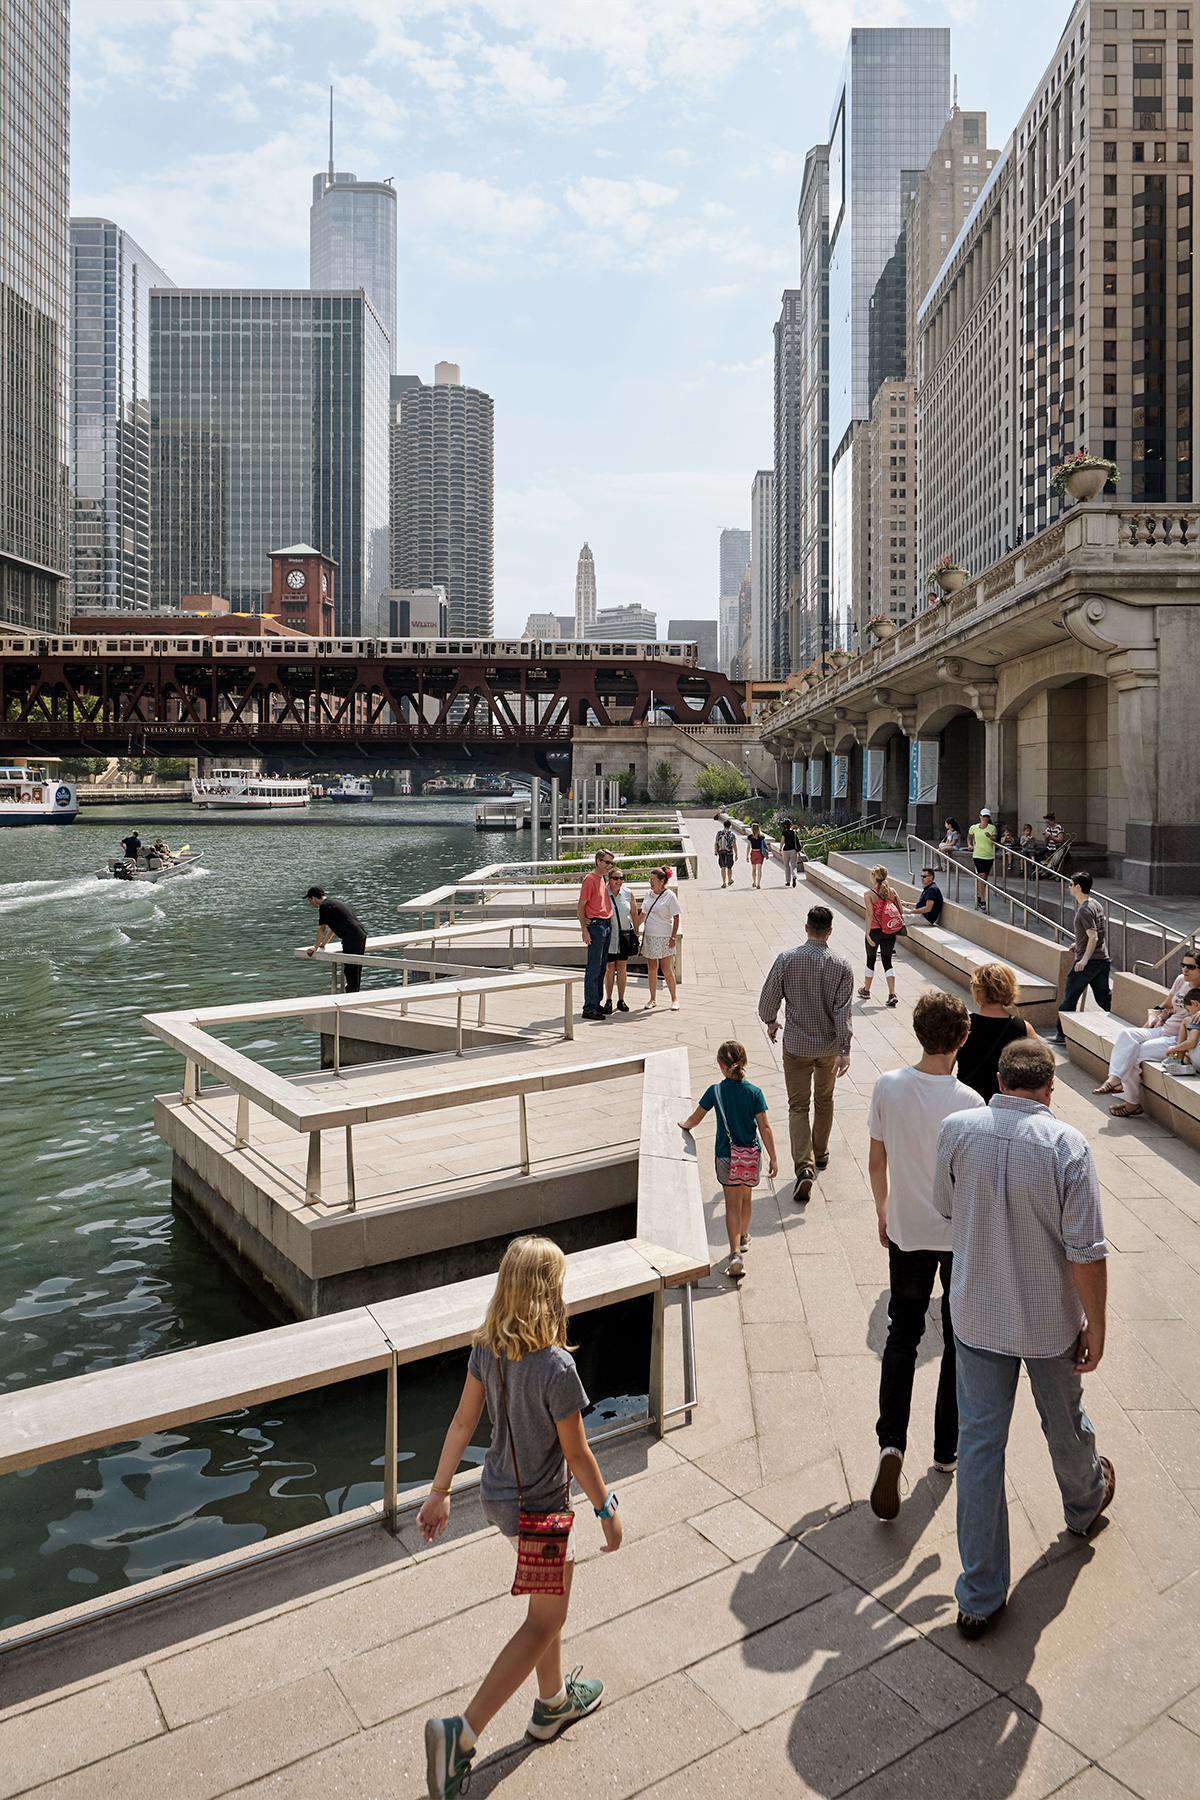 ROSS BARNEY ARCHITECTS / Chicago Riverwalk